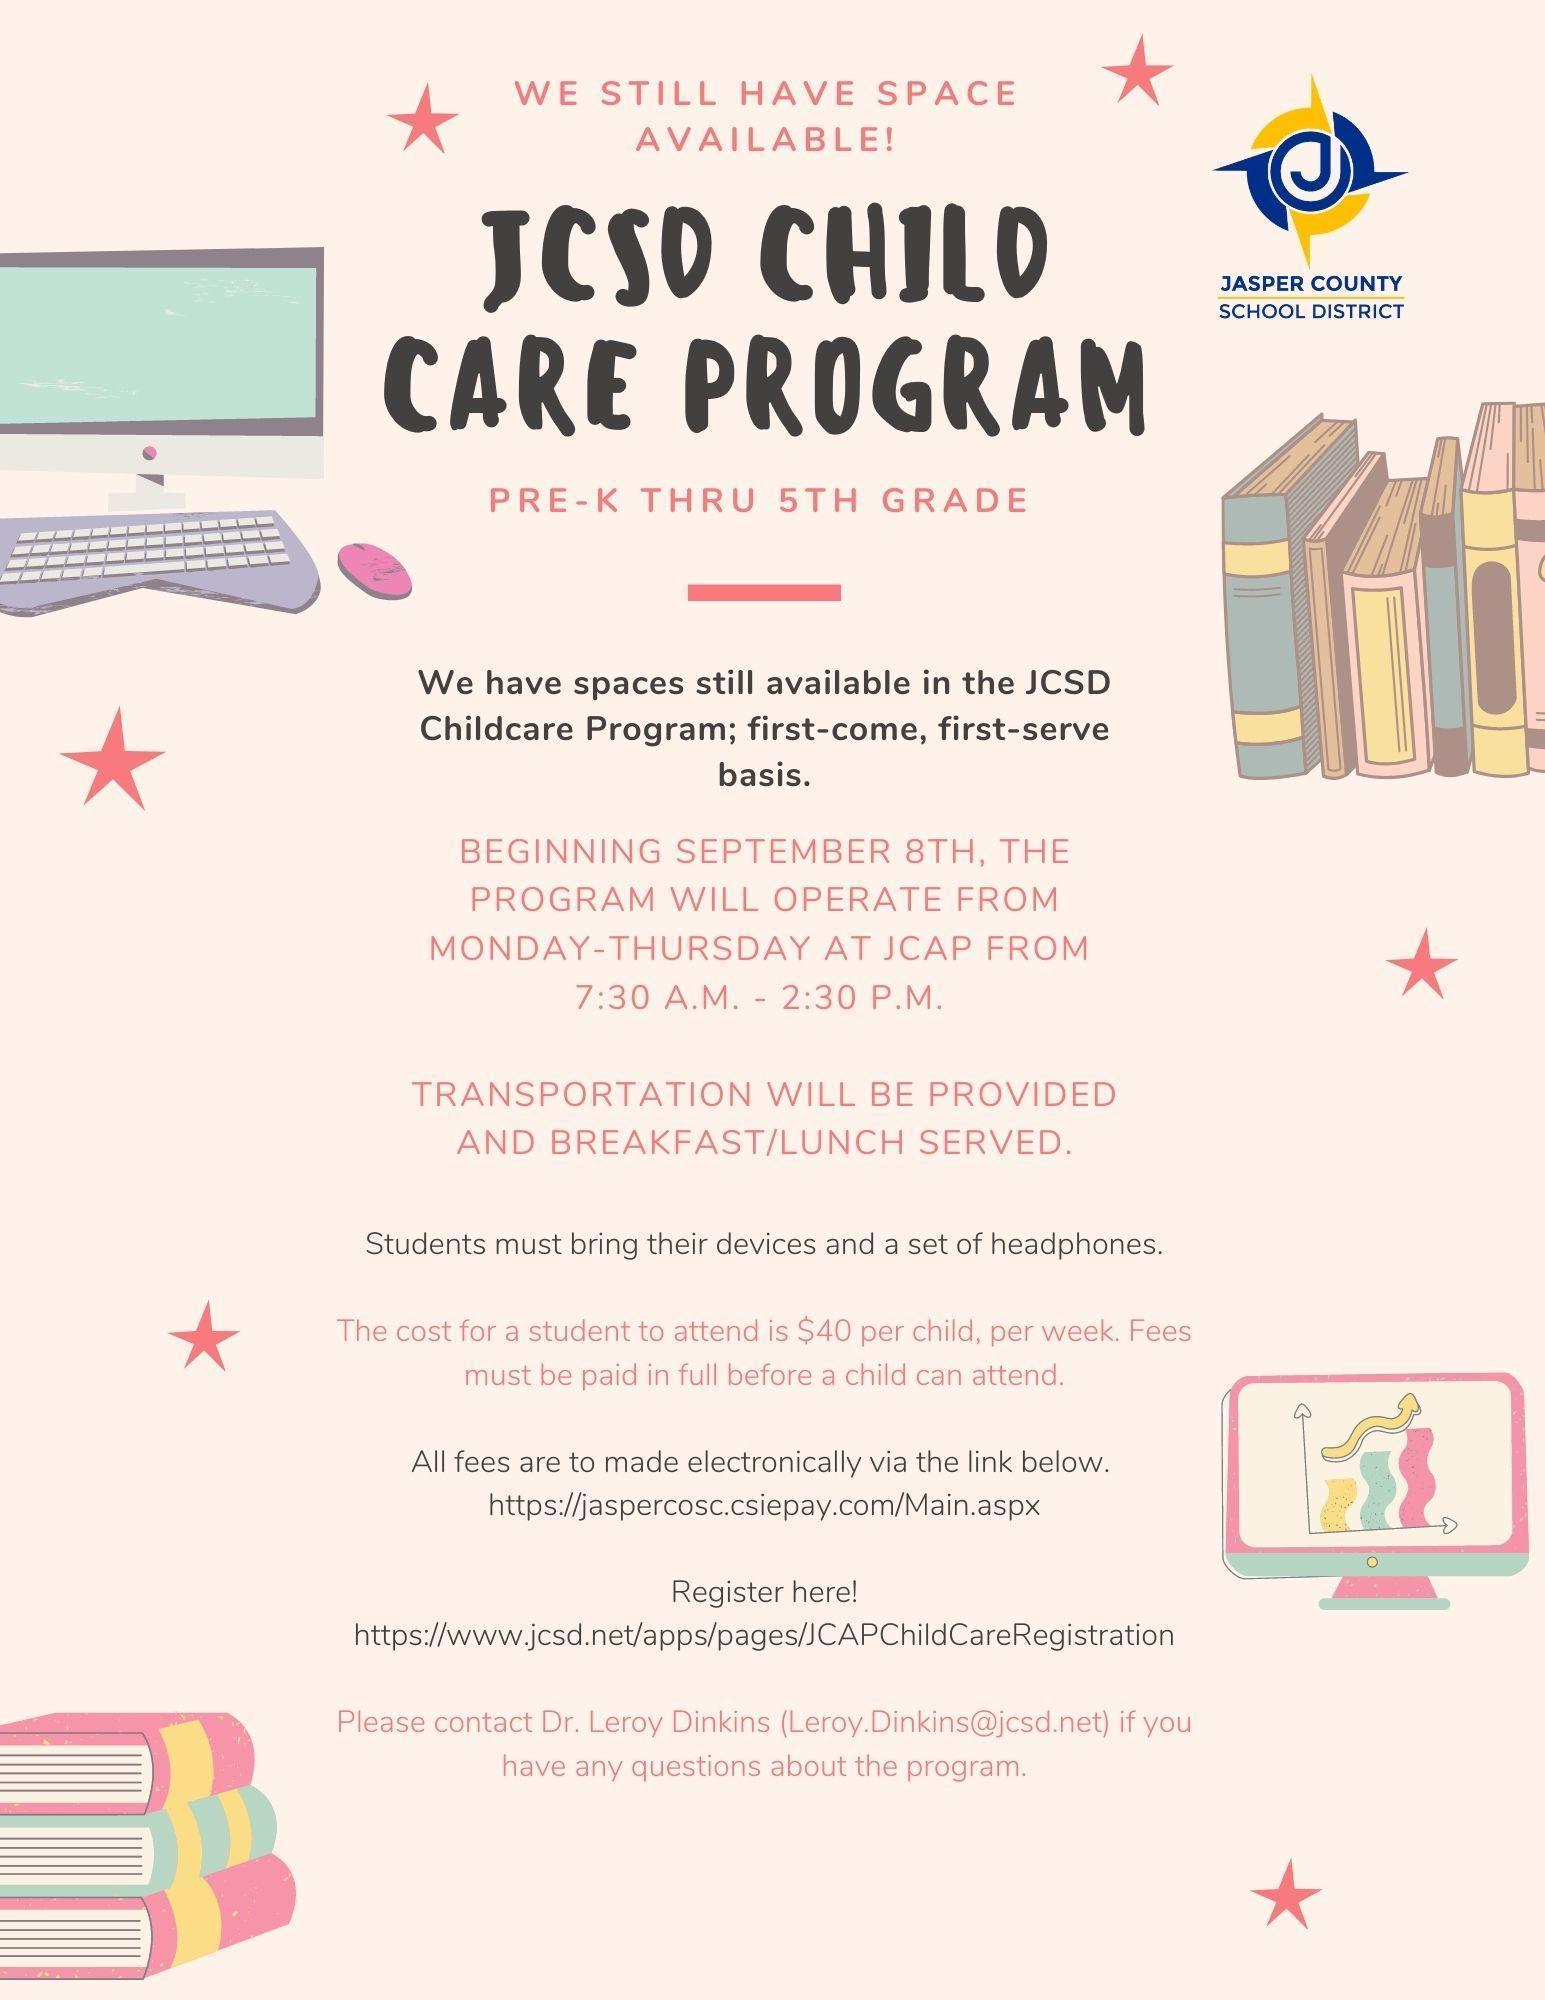 JCSD Child Care Program